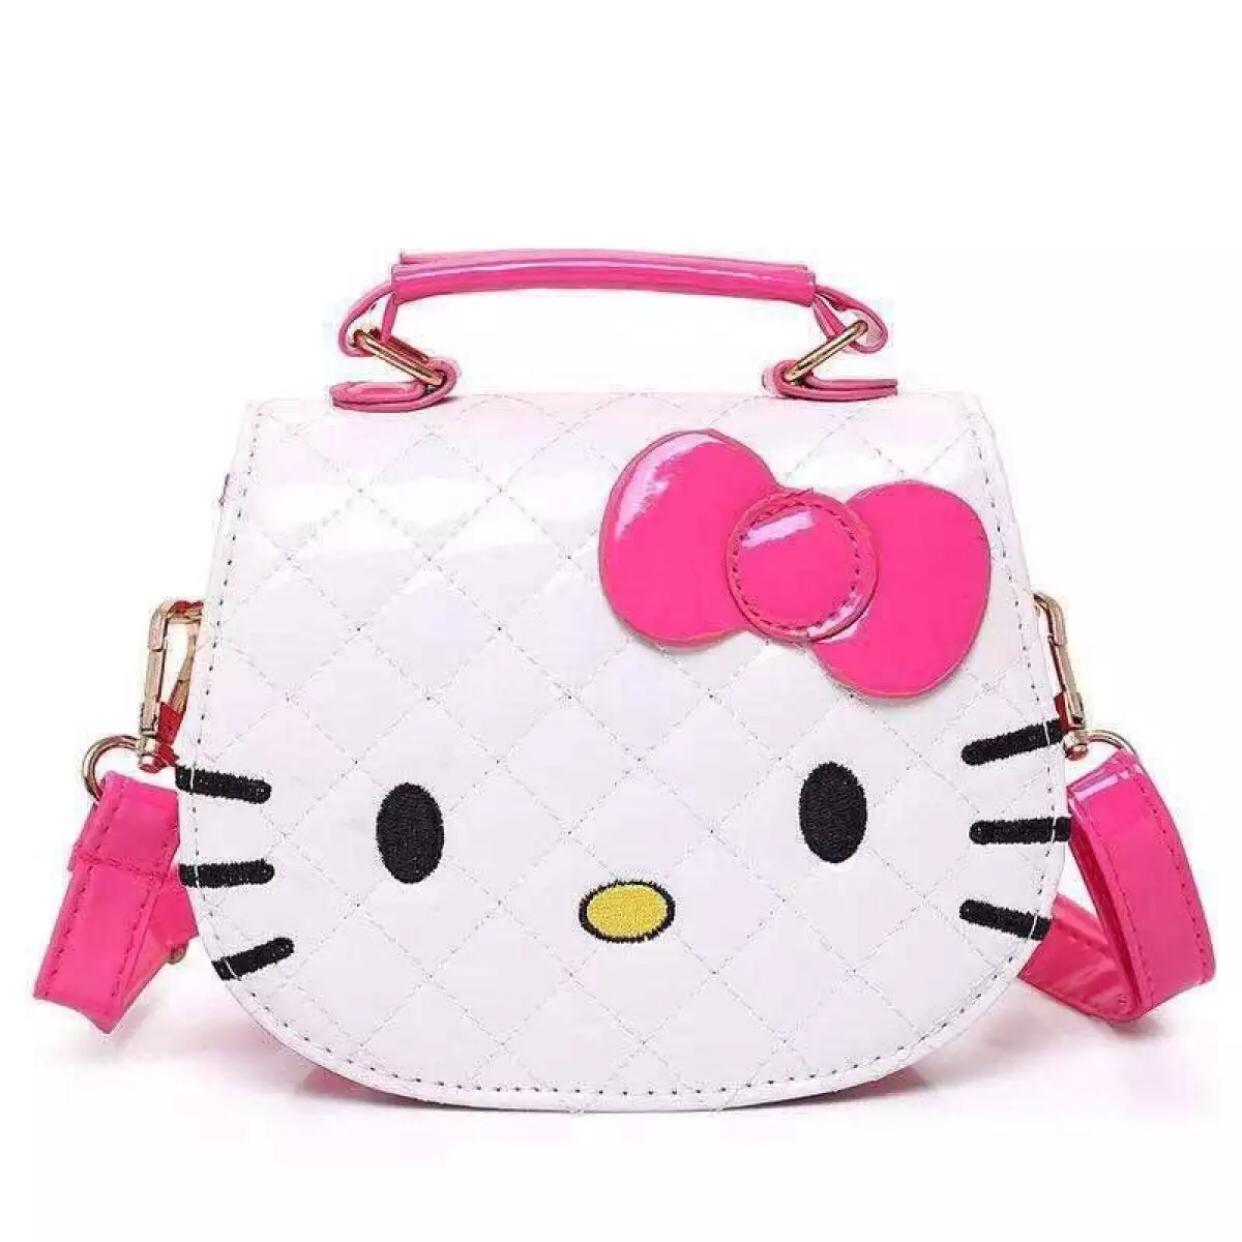 c46c7ceb7 Flagship#Hello kittysling bag Shiny Leather Kitty Shoulder Bag Sling Bag  Fashion Bag #SkyWay HelloKitty   Lazada PH